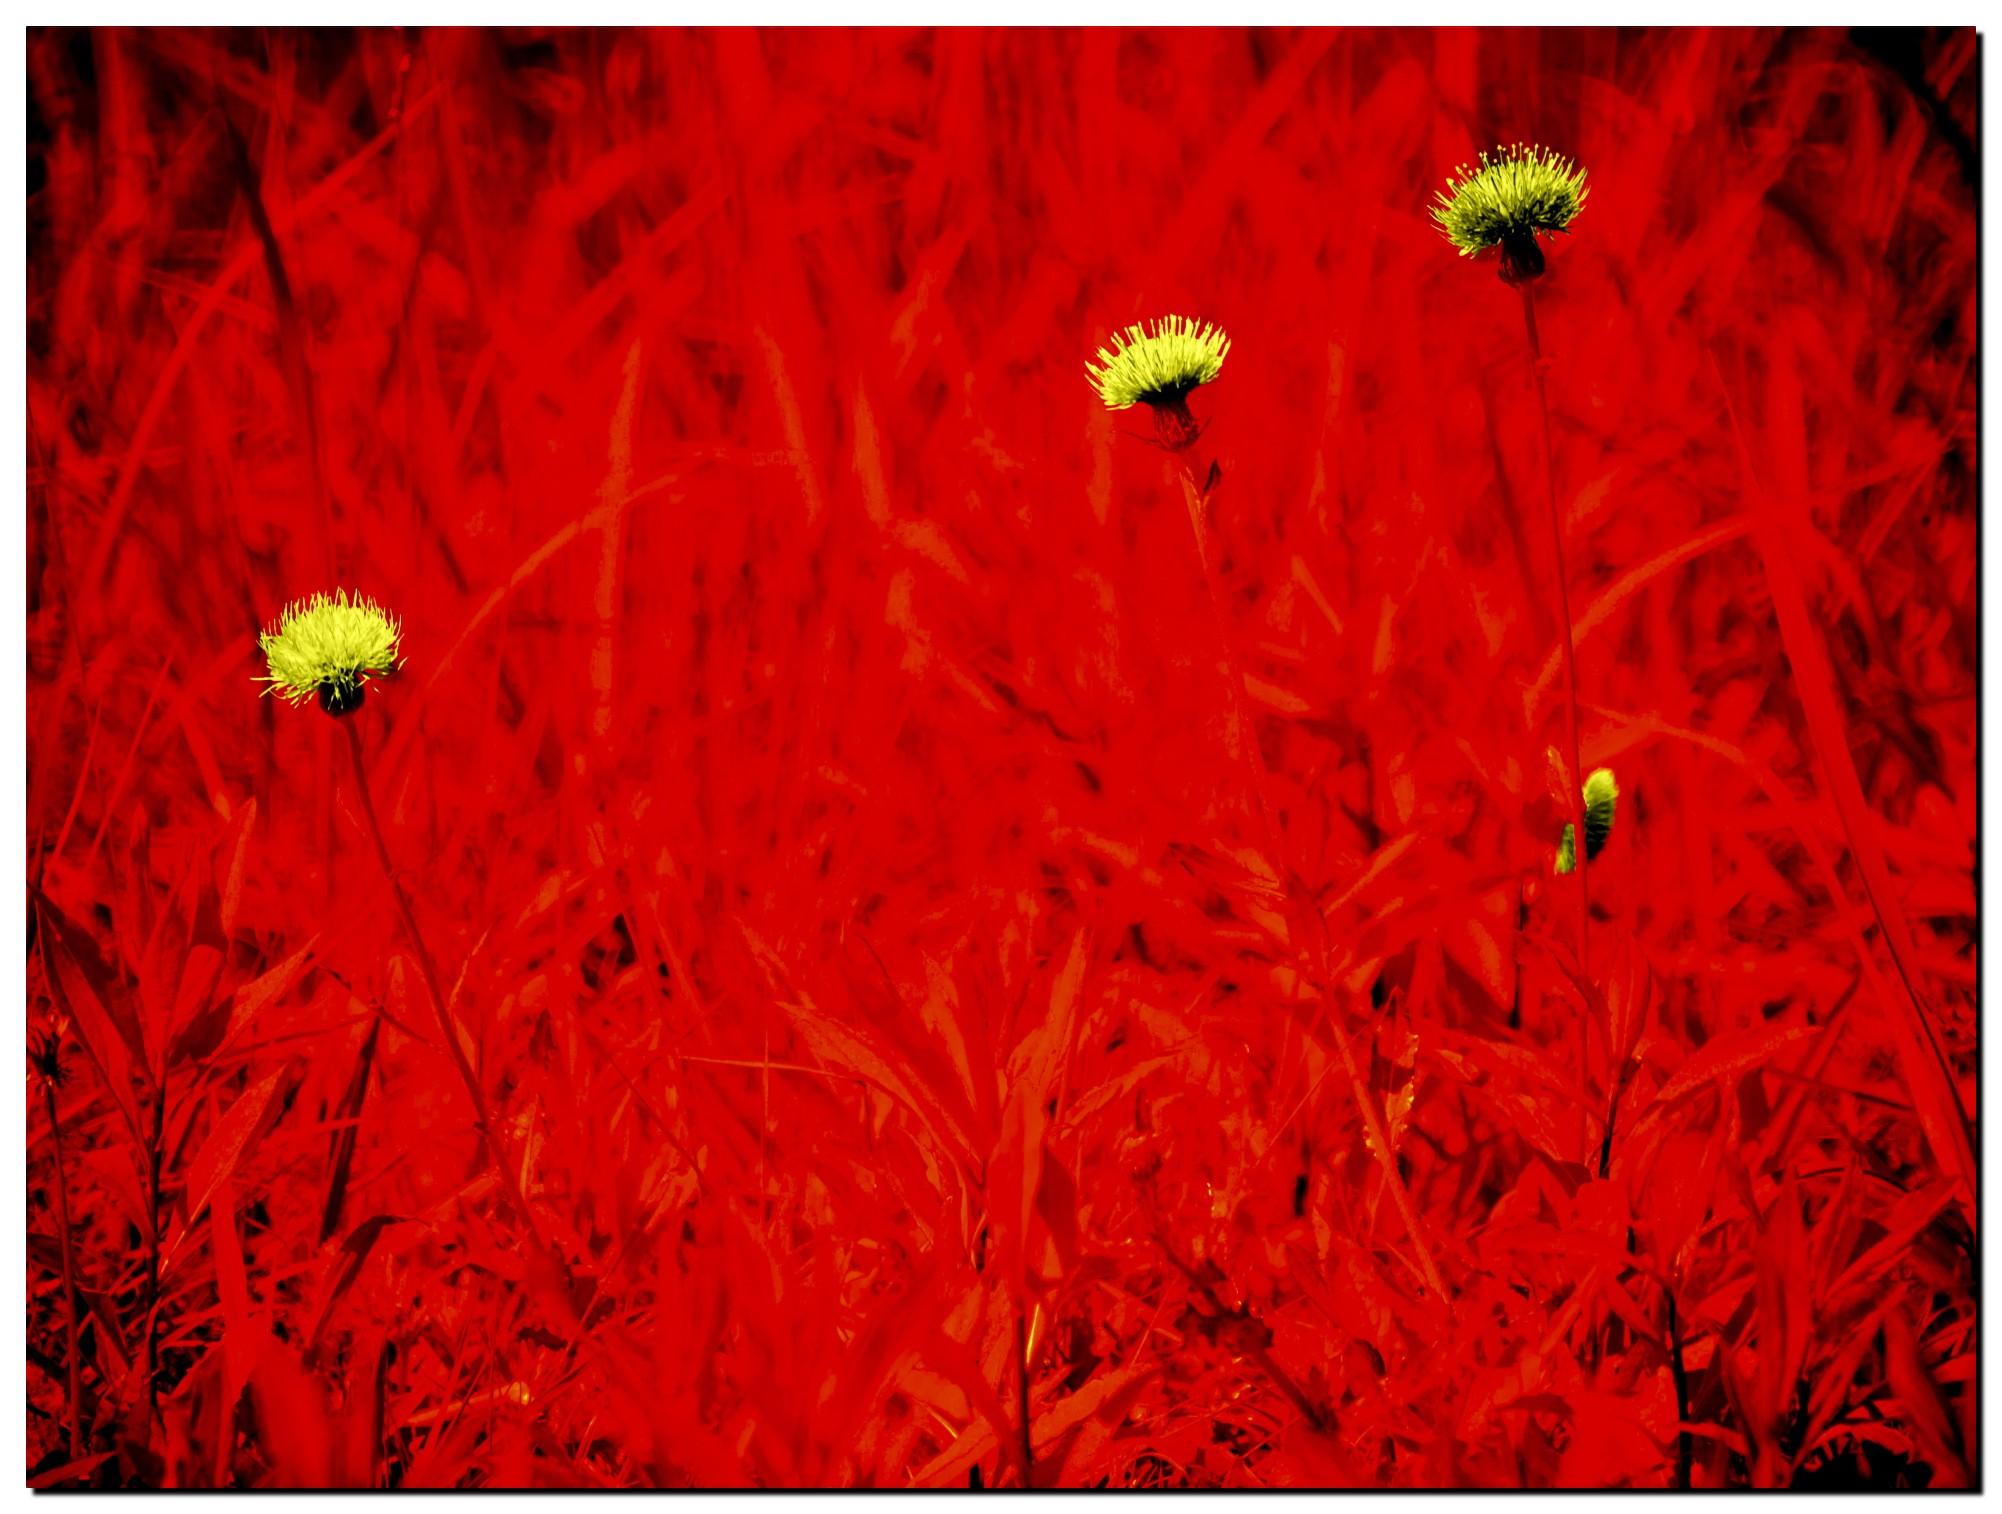 04LR6-ED200194-Edit-2-2.jpg